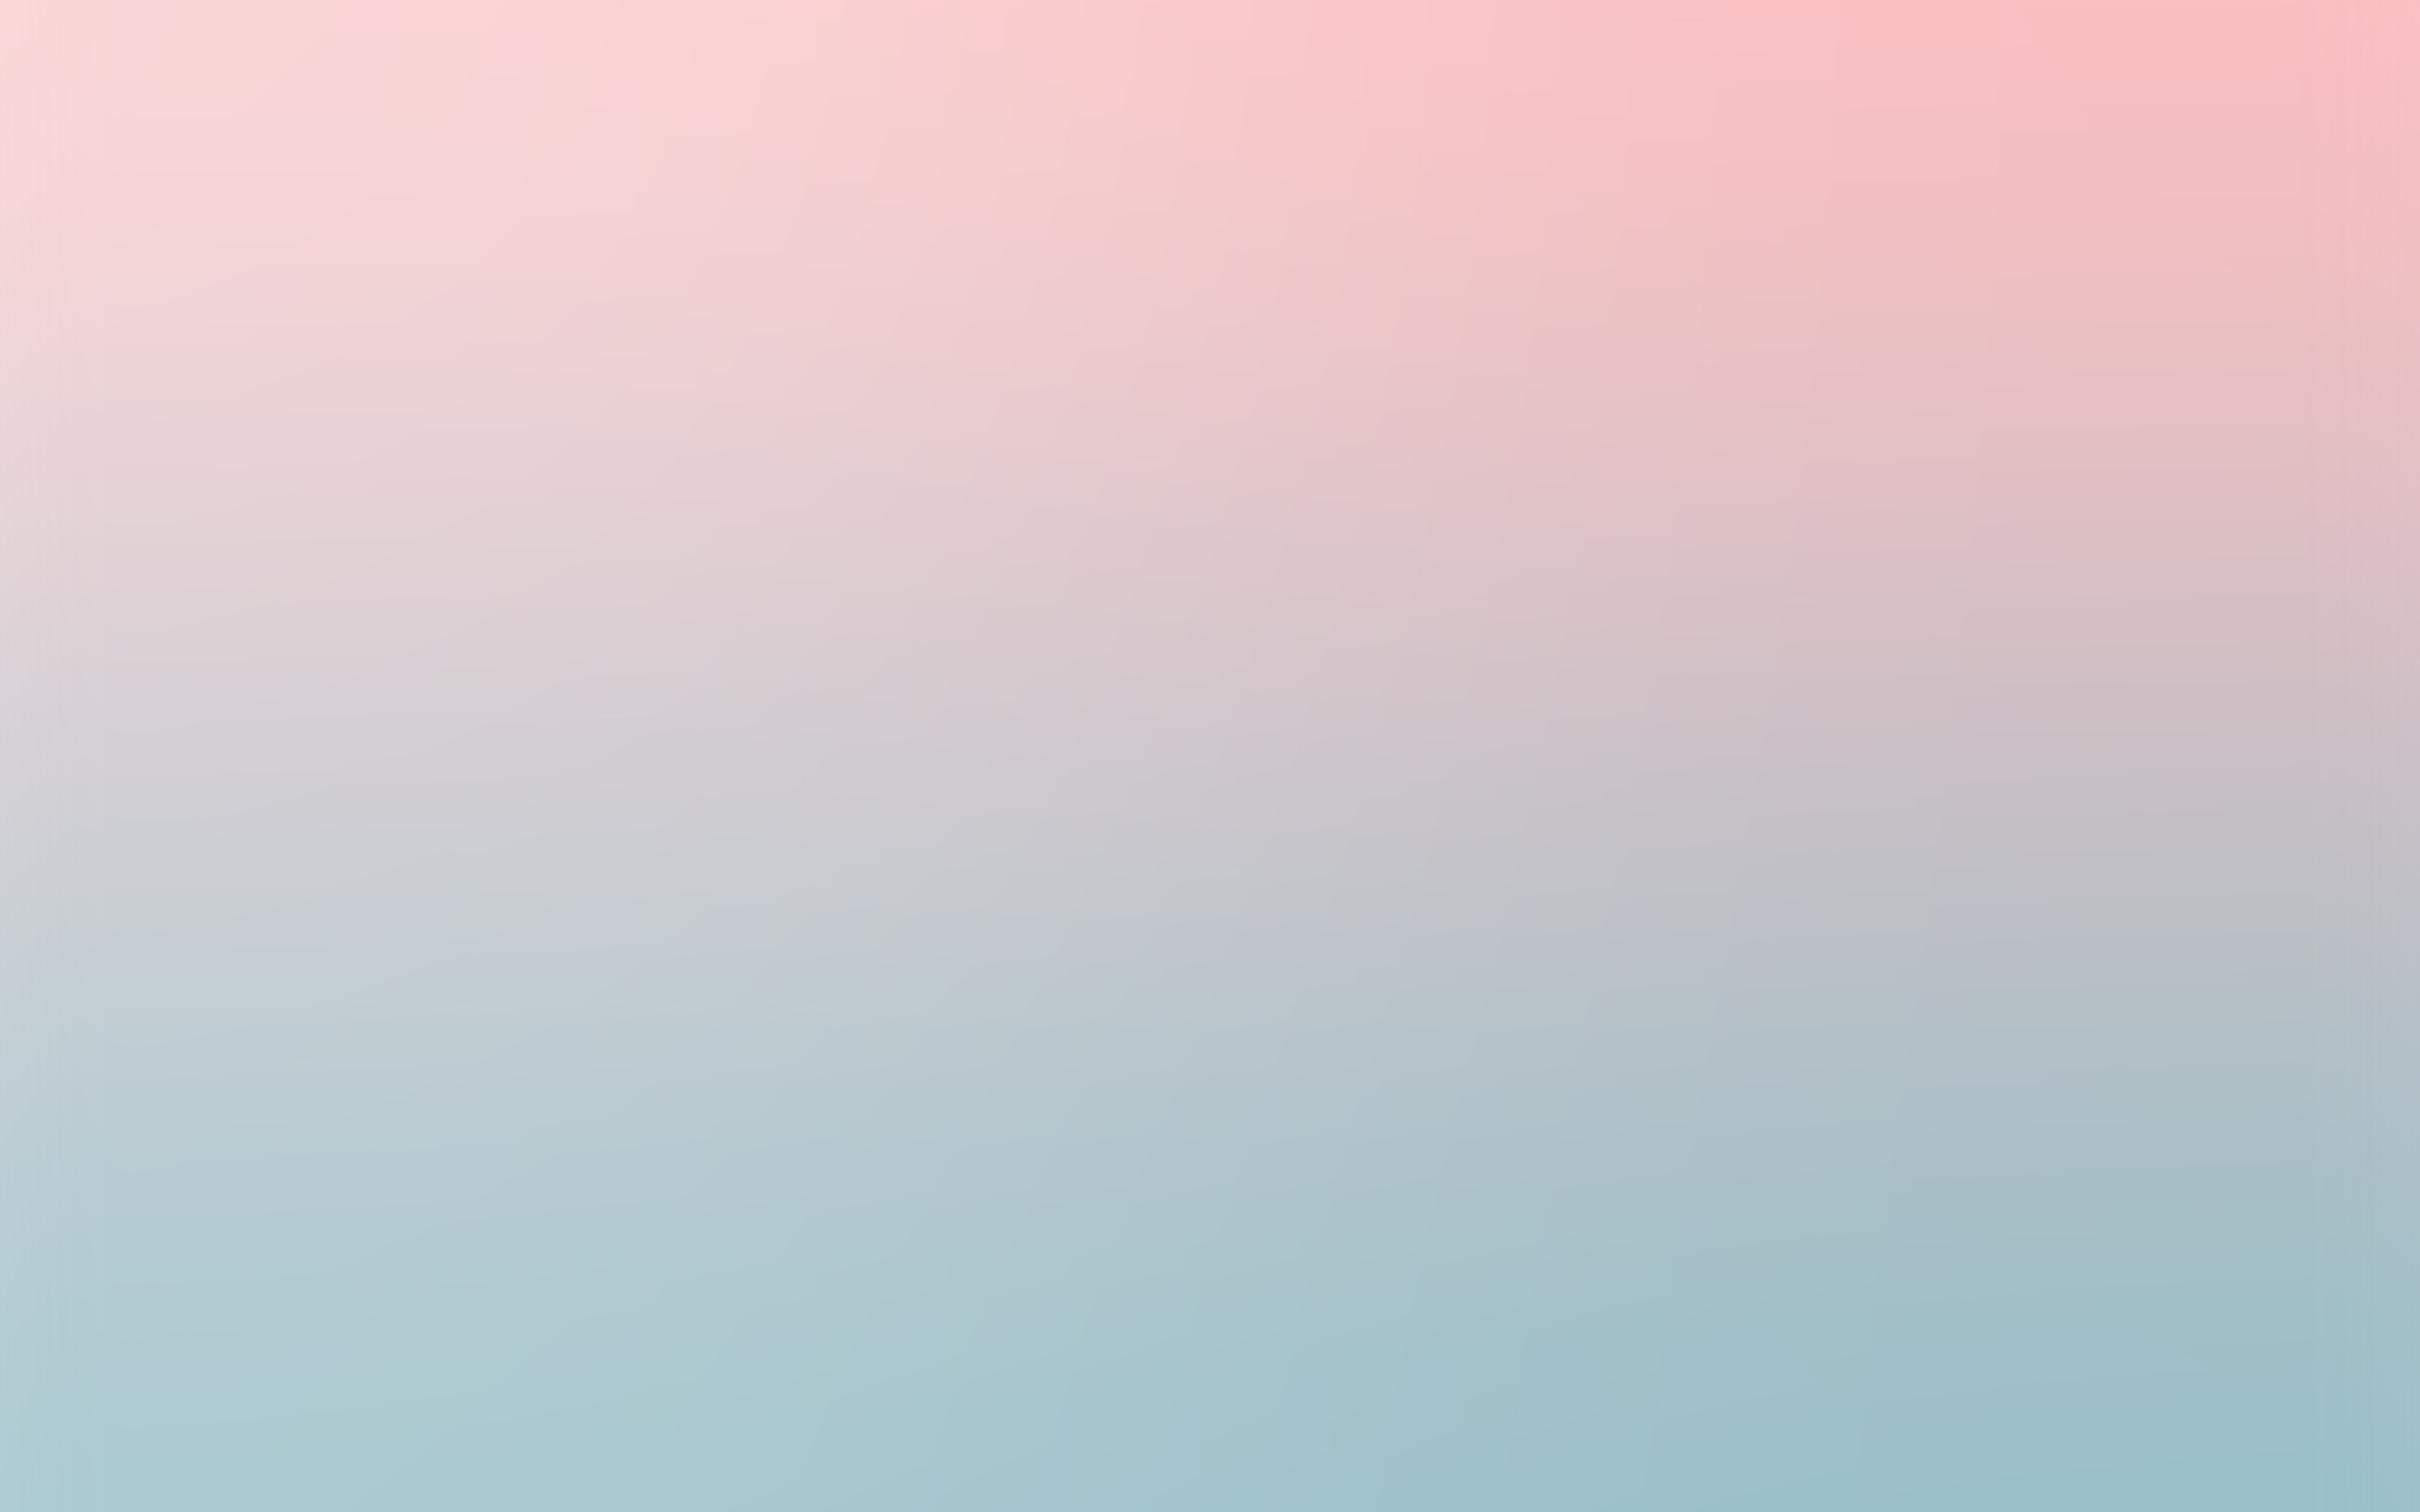 sm07-pink-blue-soft-pastel-blur-gradation-wallpaper